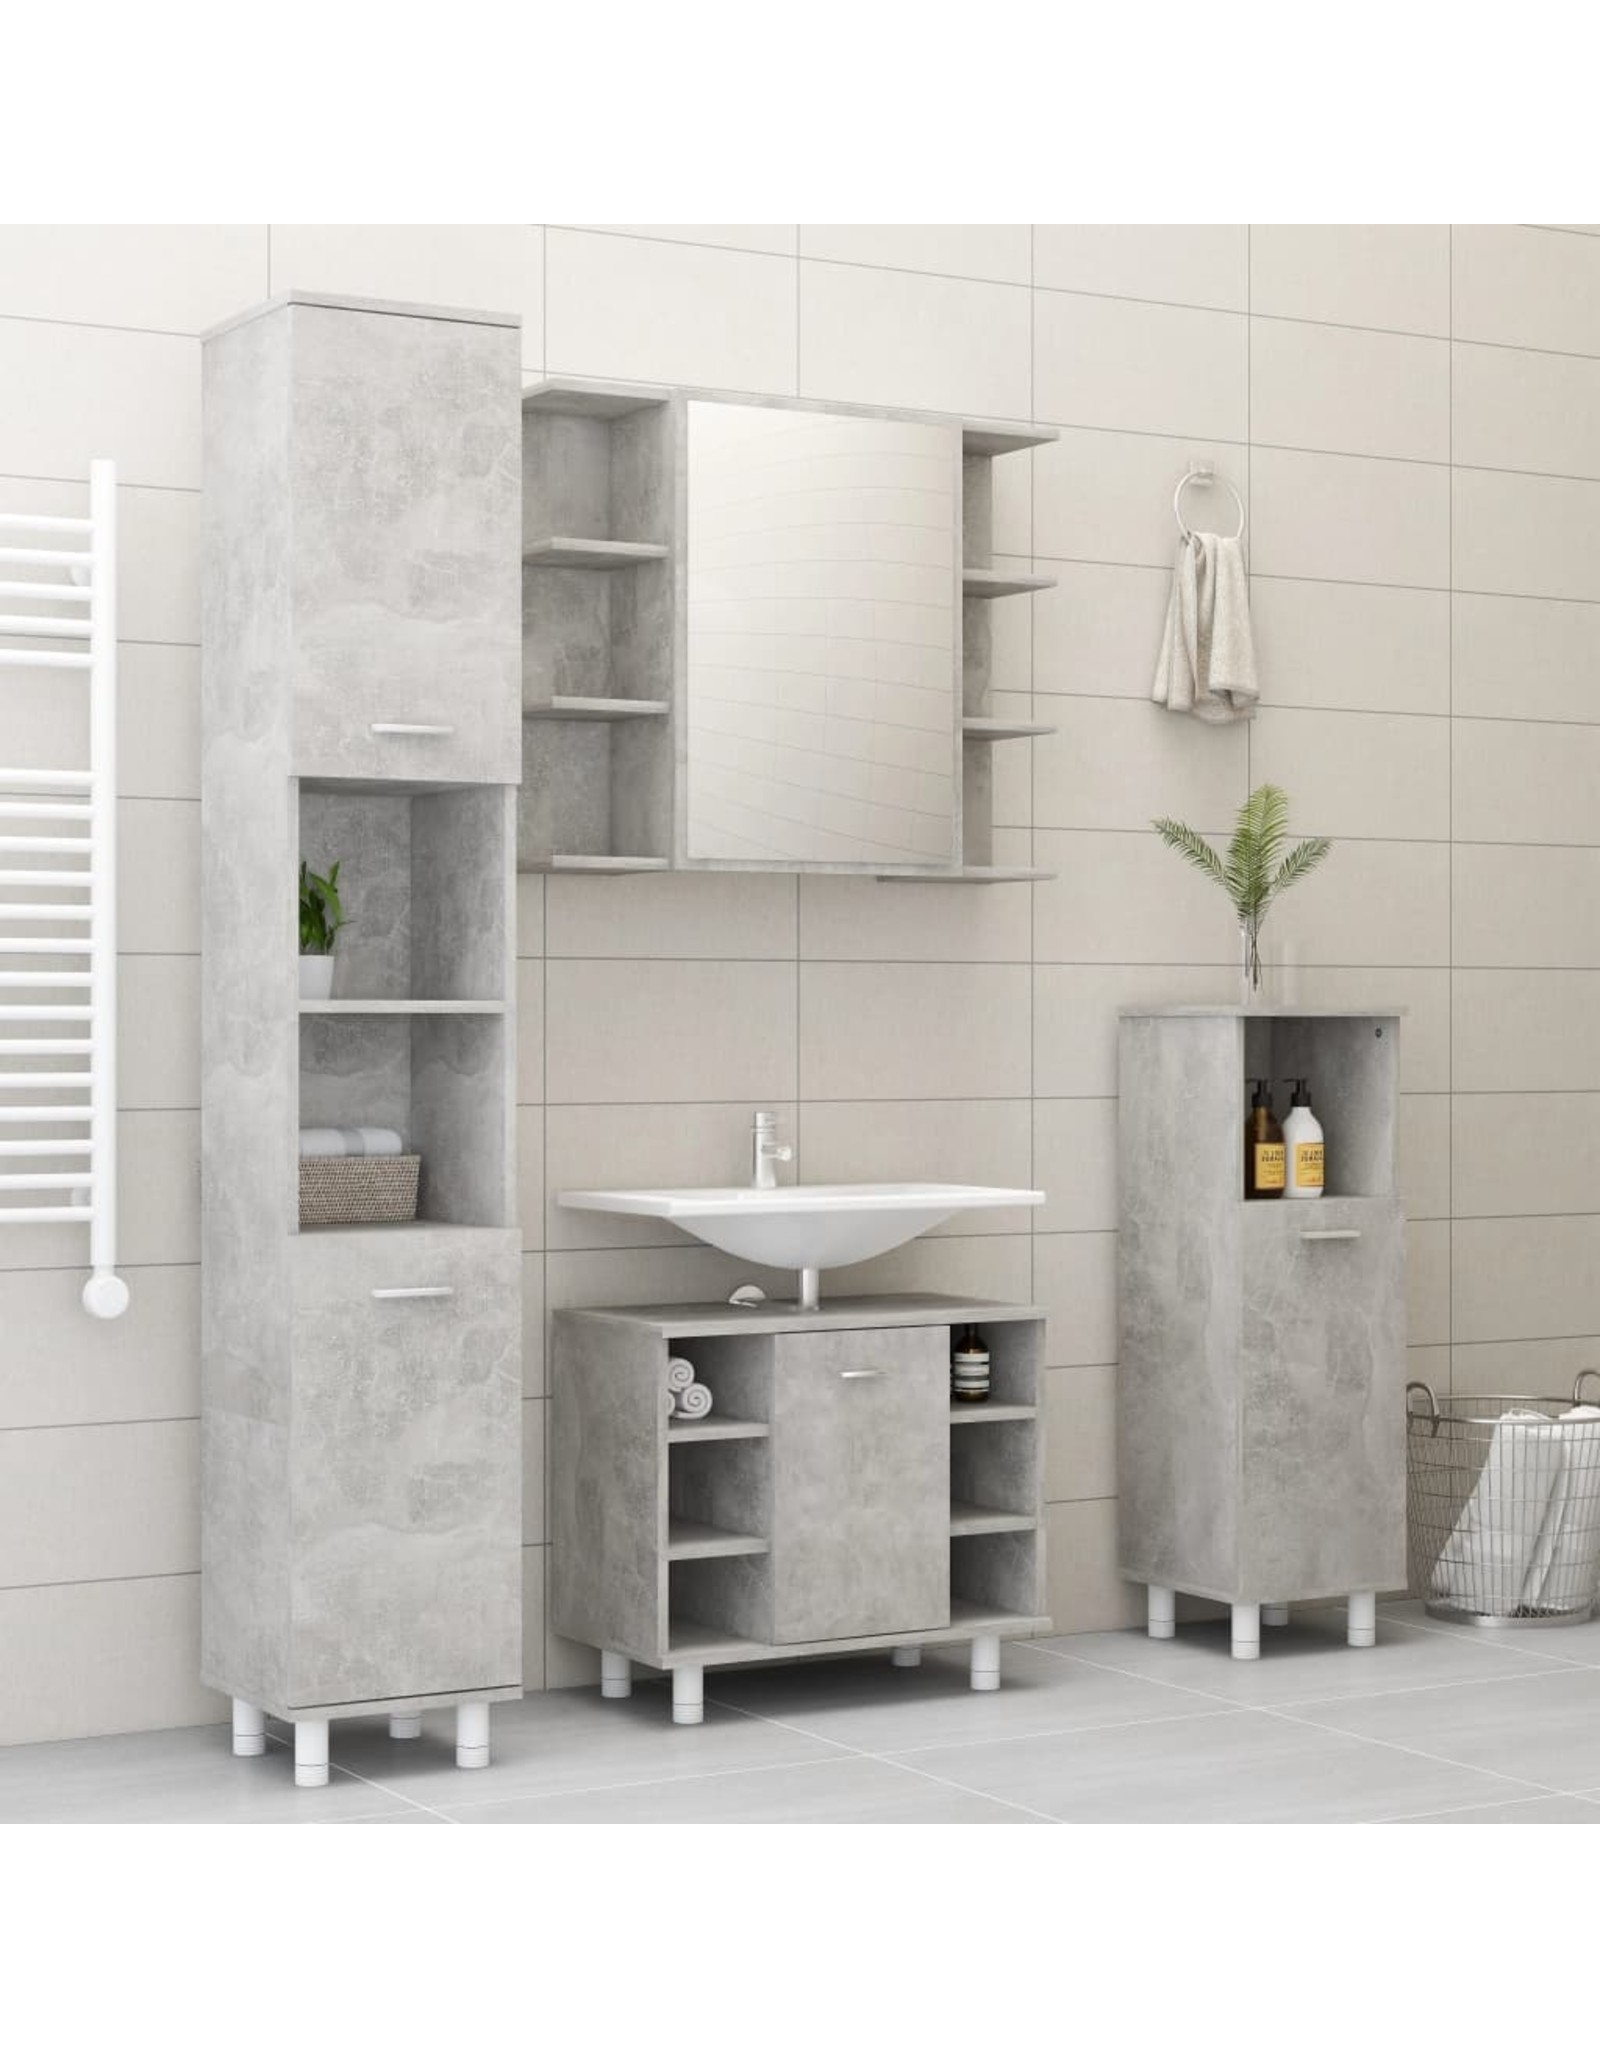 Badkamerkast 30x30x179 cm spaanplaat betongrijs